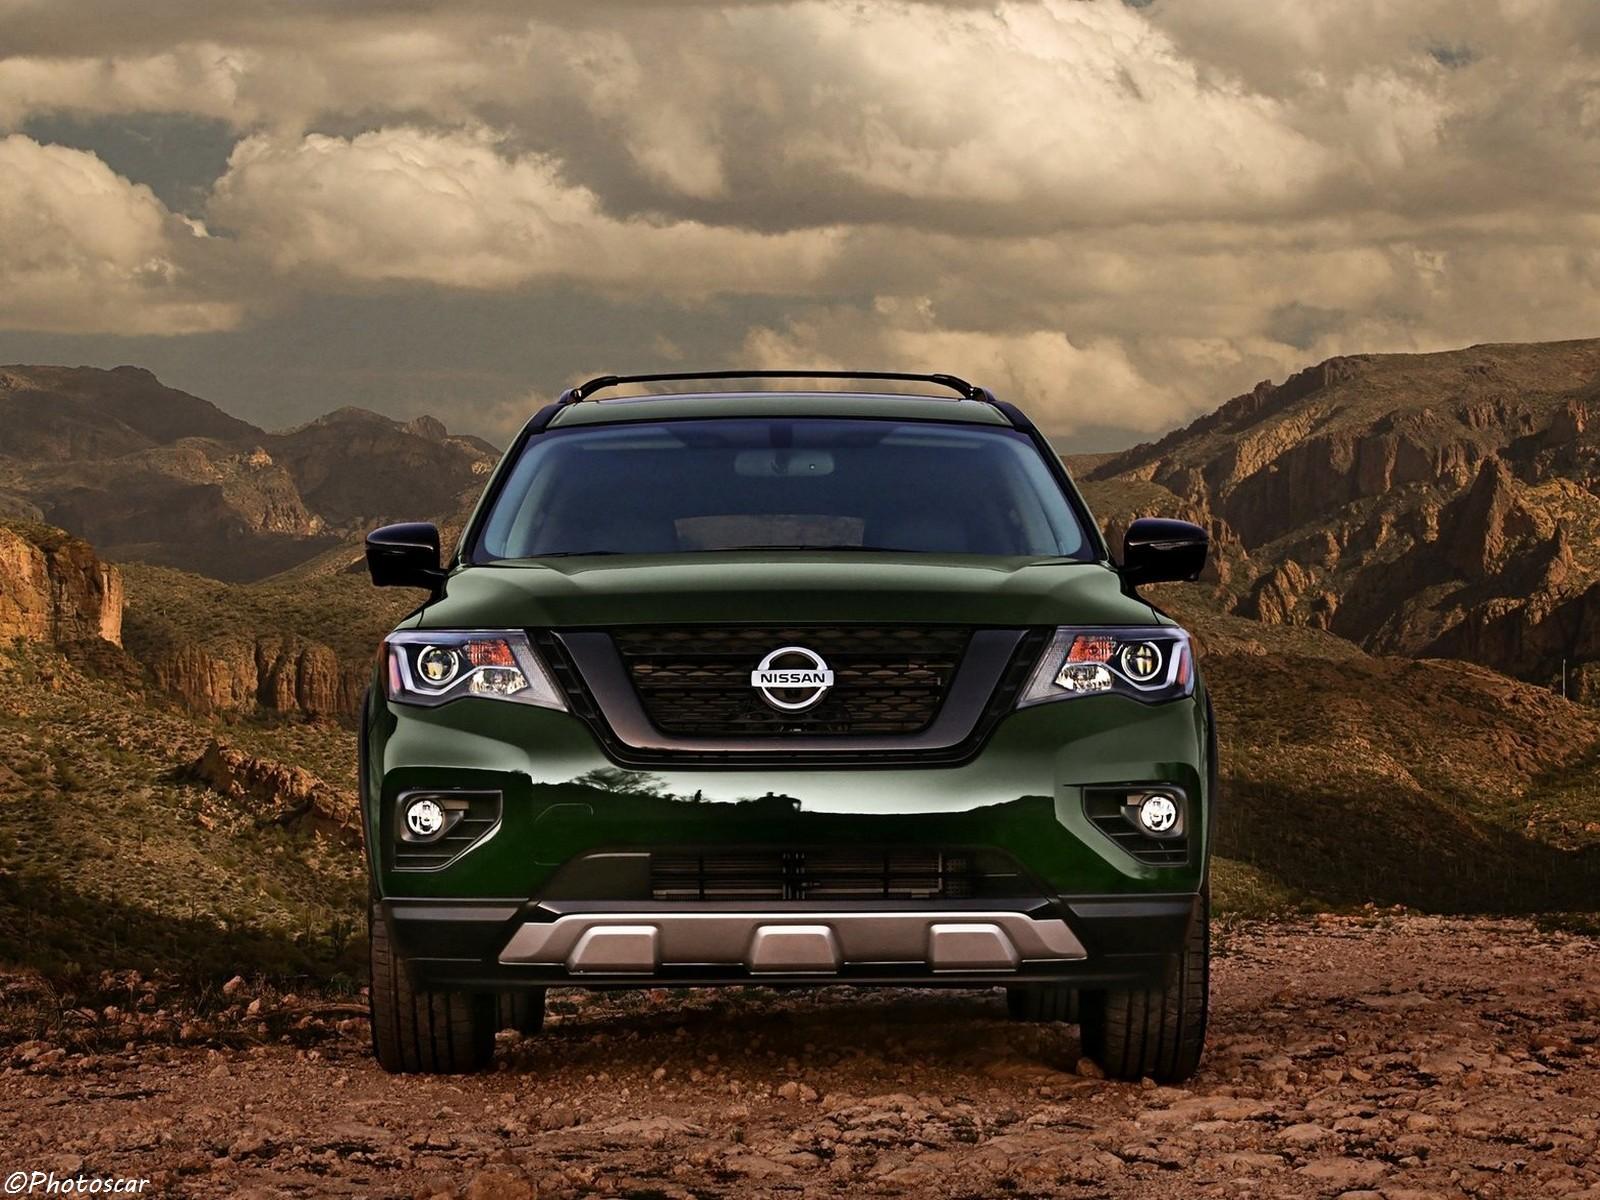 Nissan Pathfinder Rock Creek Edition 2019